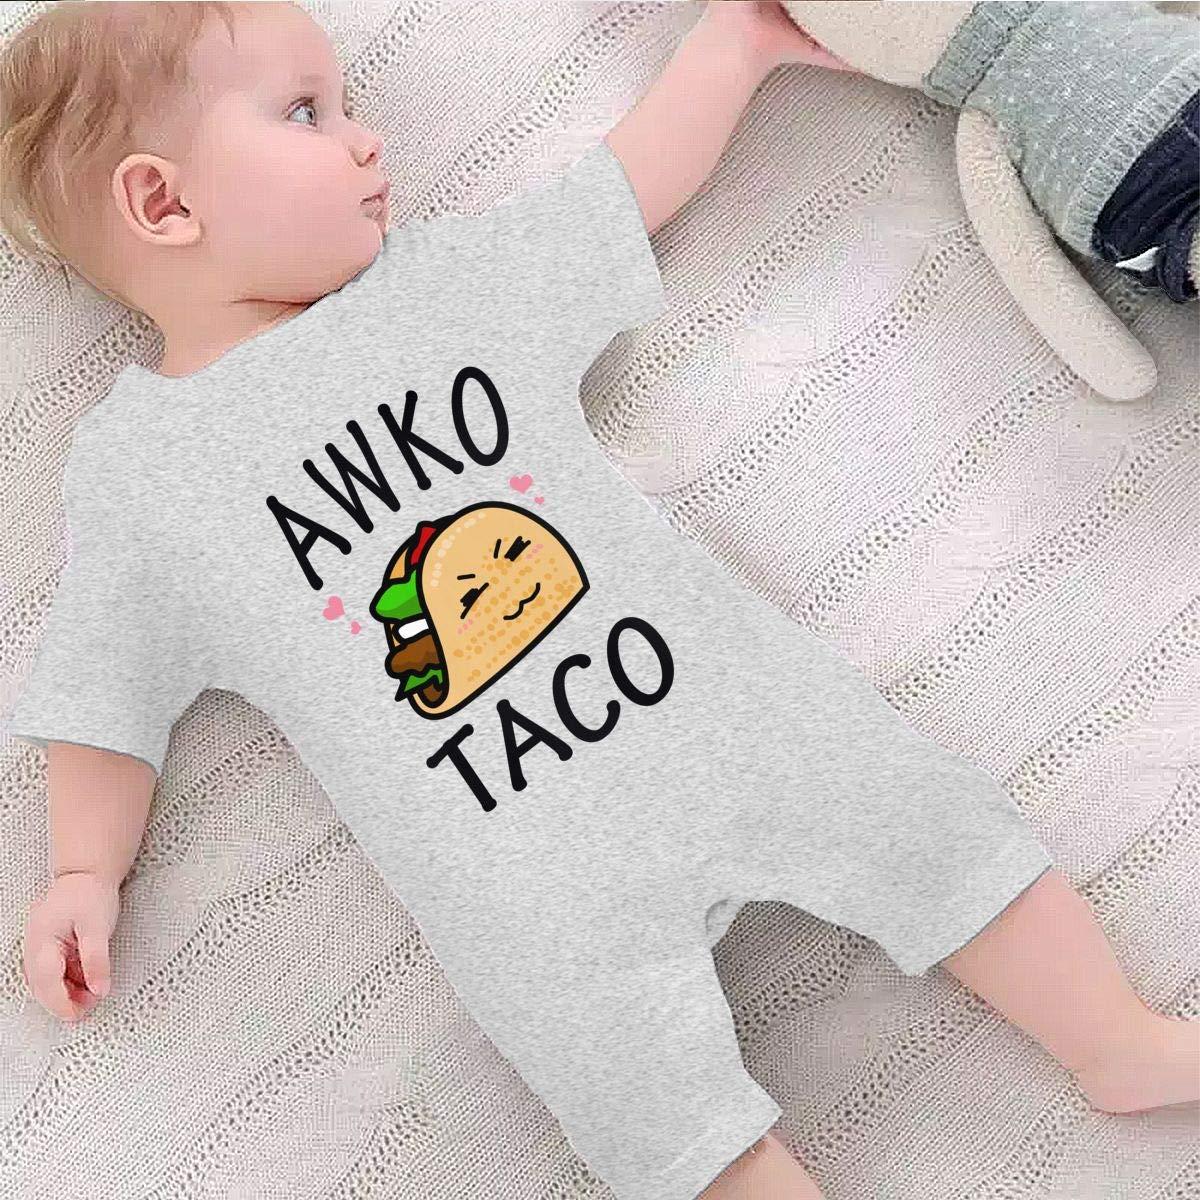 YINGFG Baby Boys Girls Short Sleeve Jumpsuit Awko Taco Cotton Romper